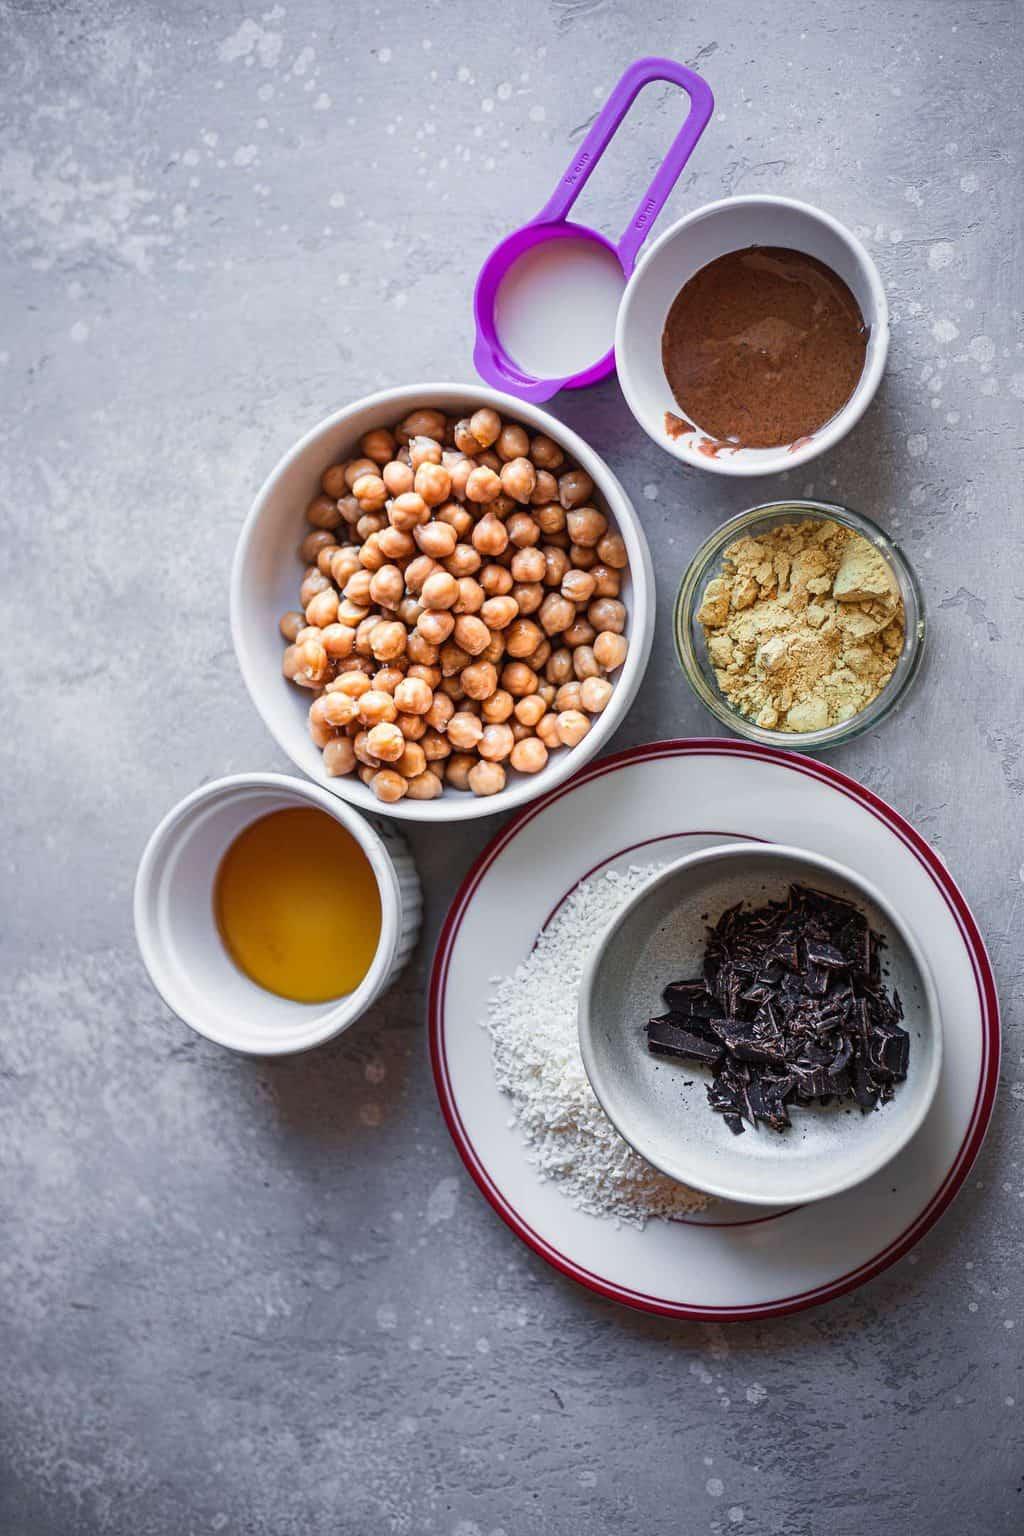 Vegan cookie dough ingredients